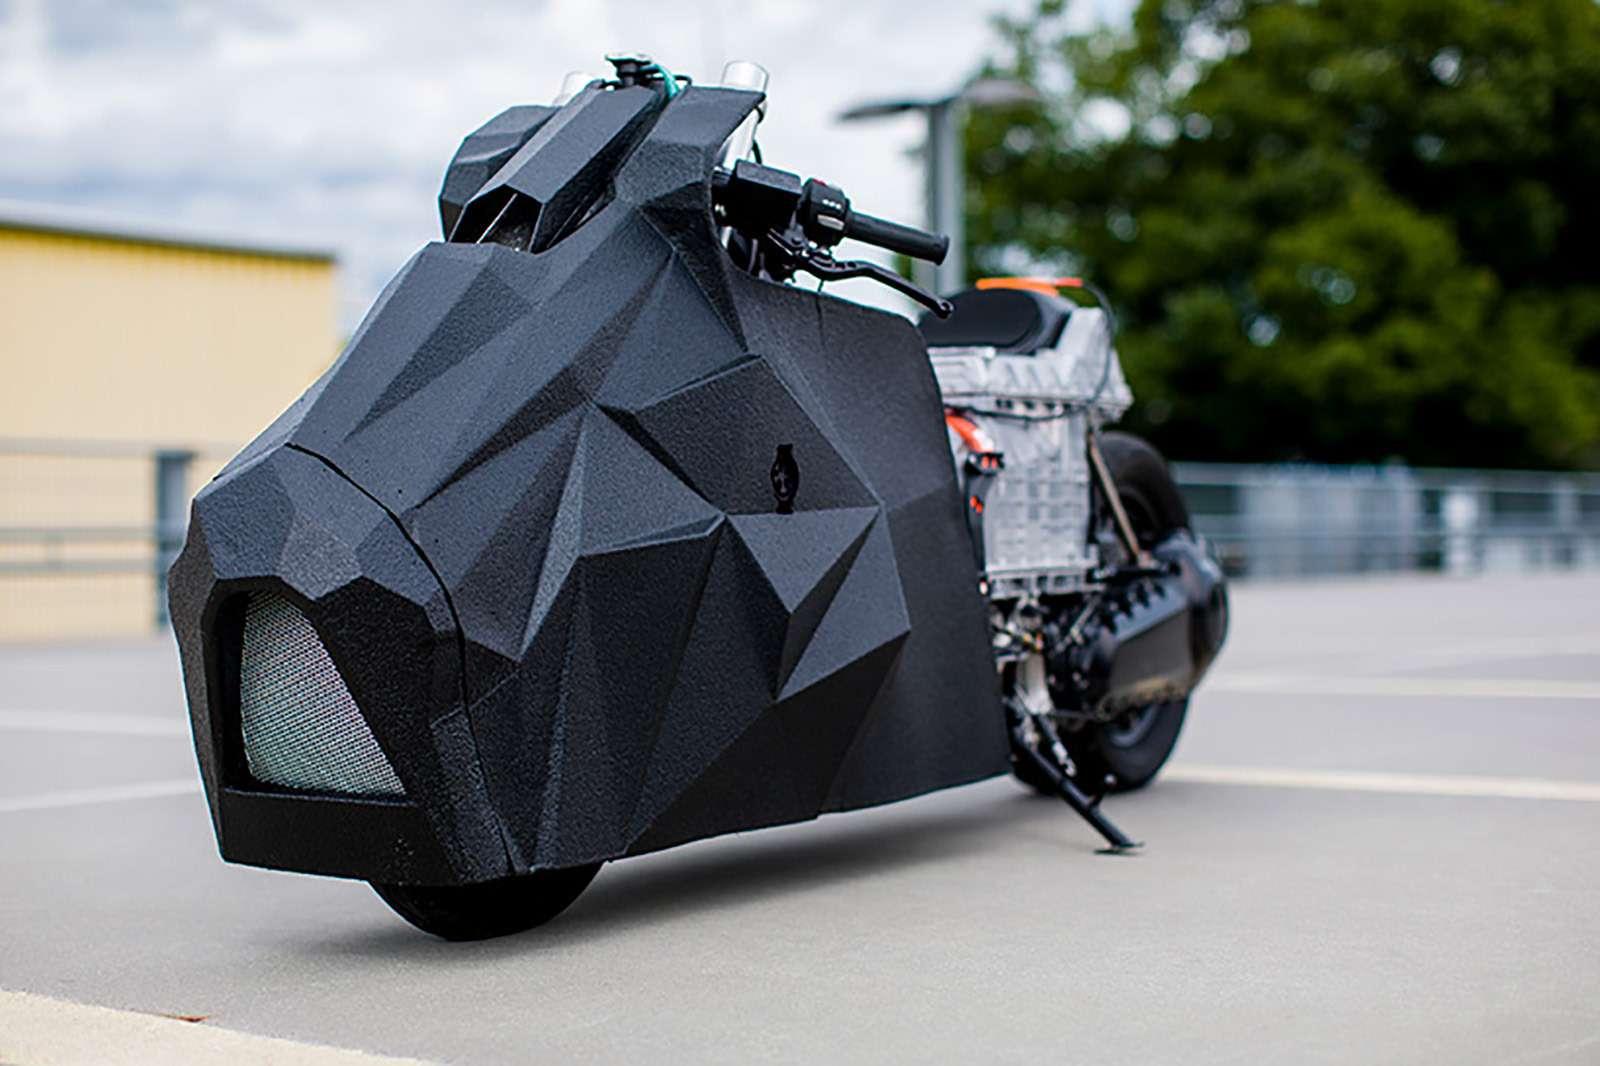 Немец превратил электроскутер BMW вбэтмобиль— фото 789651